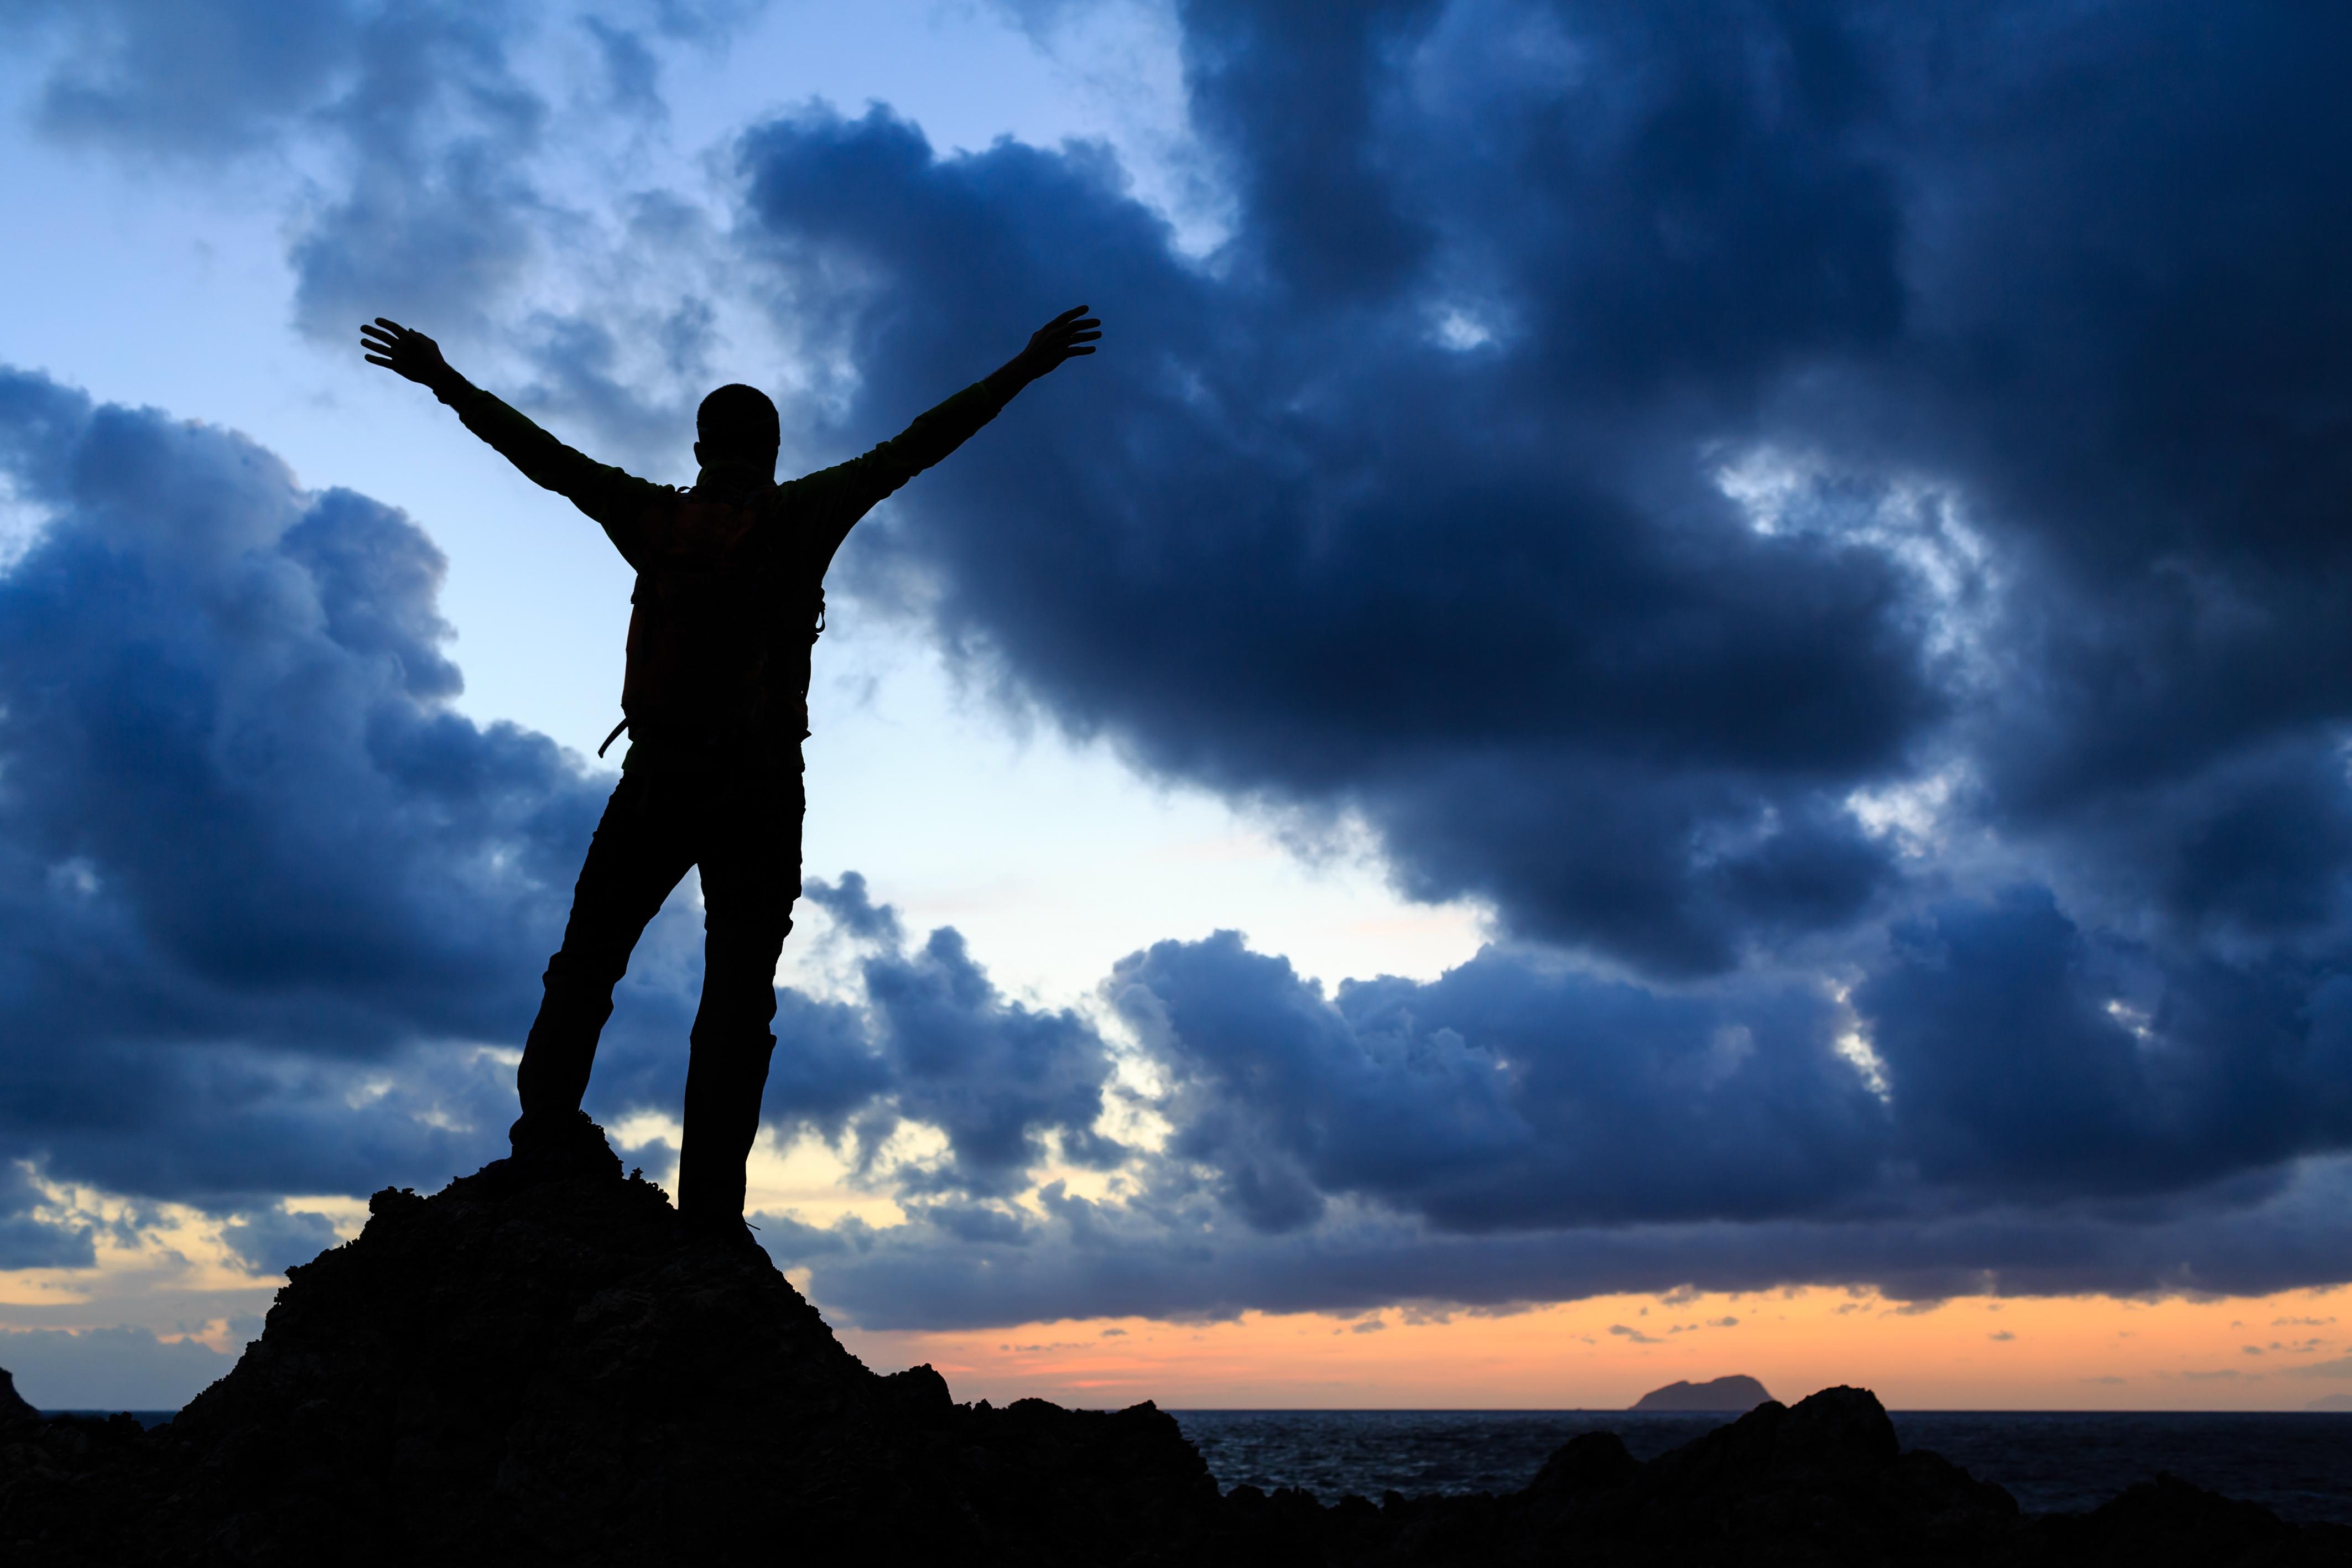 happy-winner-reaching-life-goal-success-man-P7VKMH2